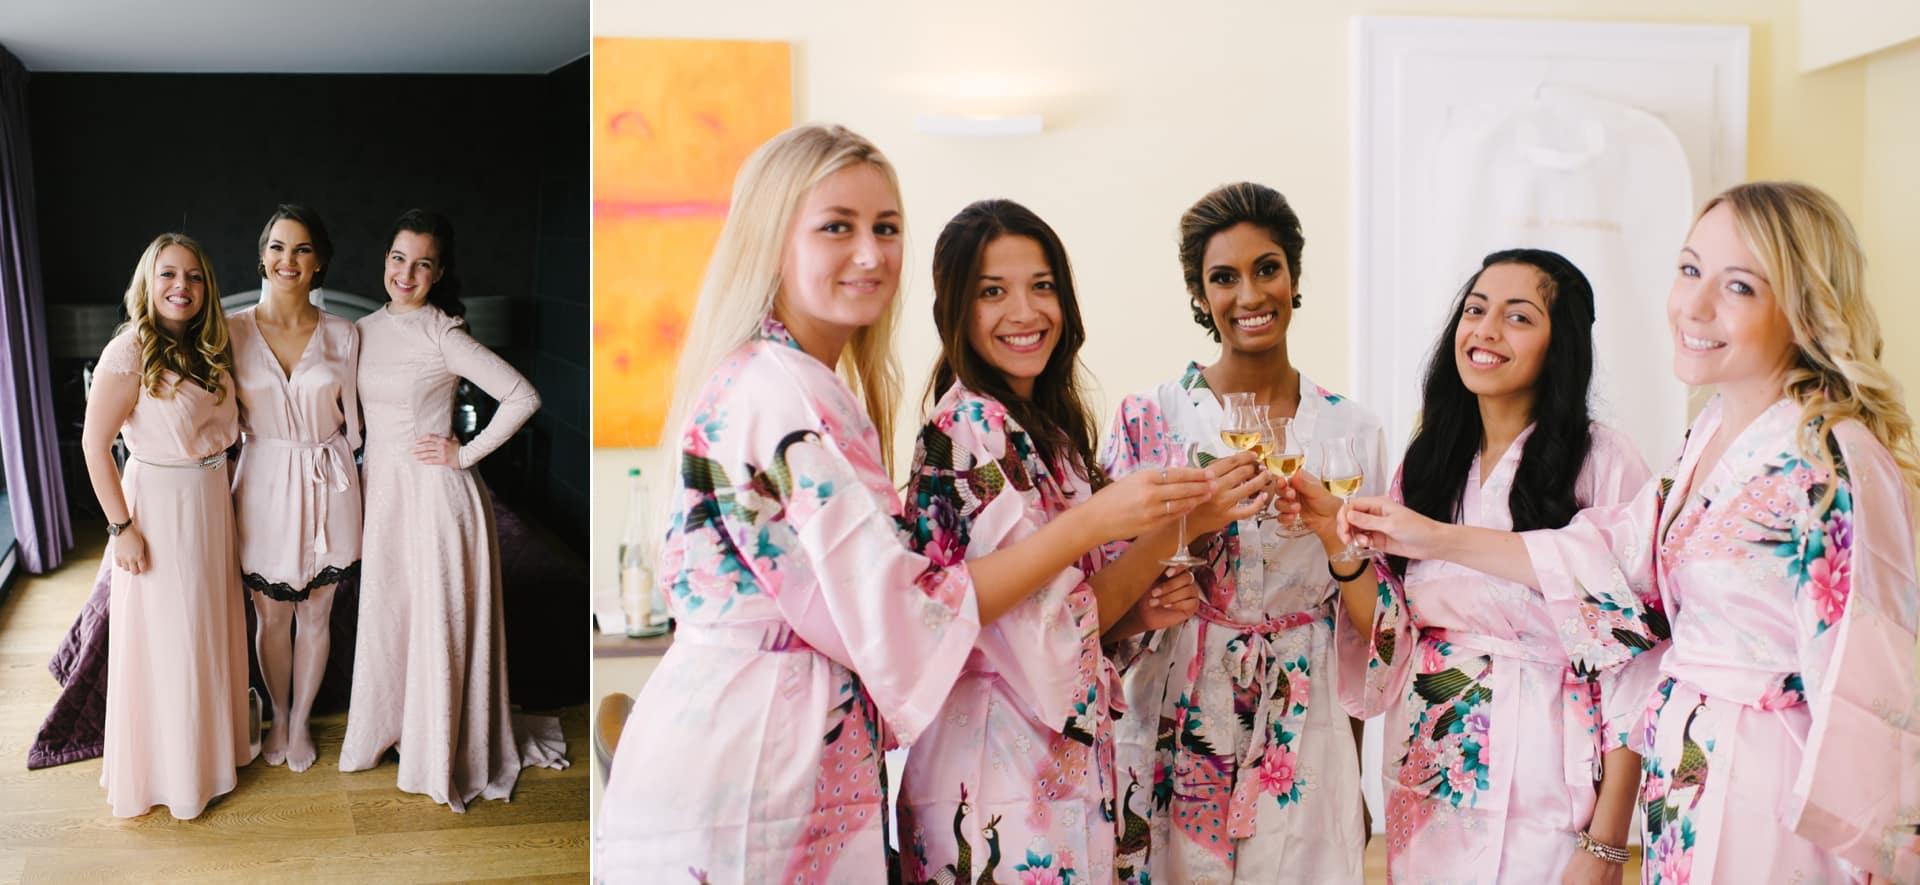 Braut und Brautjungfern im Kimono.